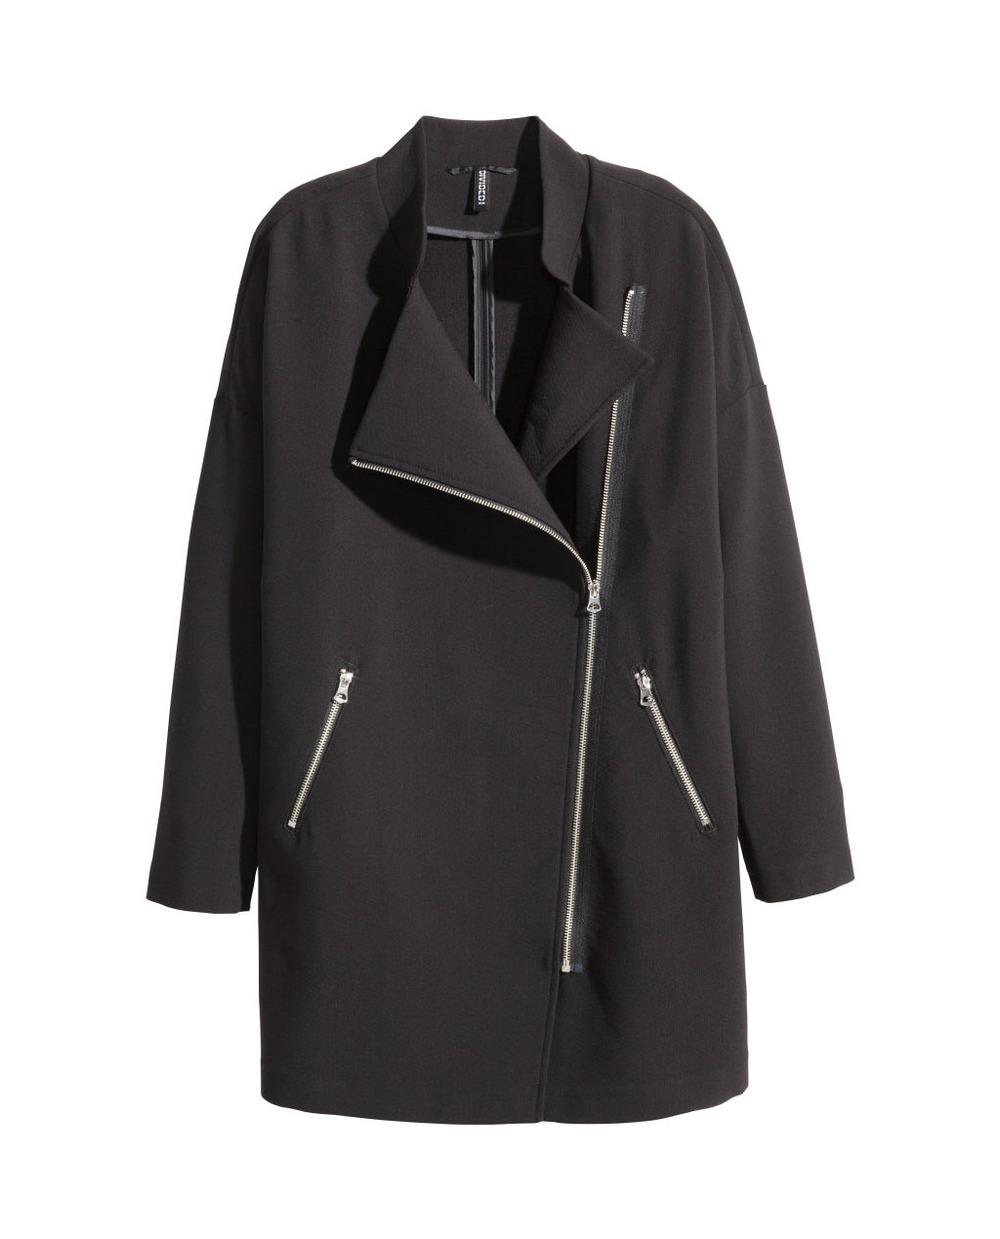 hm jacket.jpg